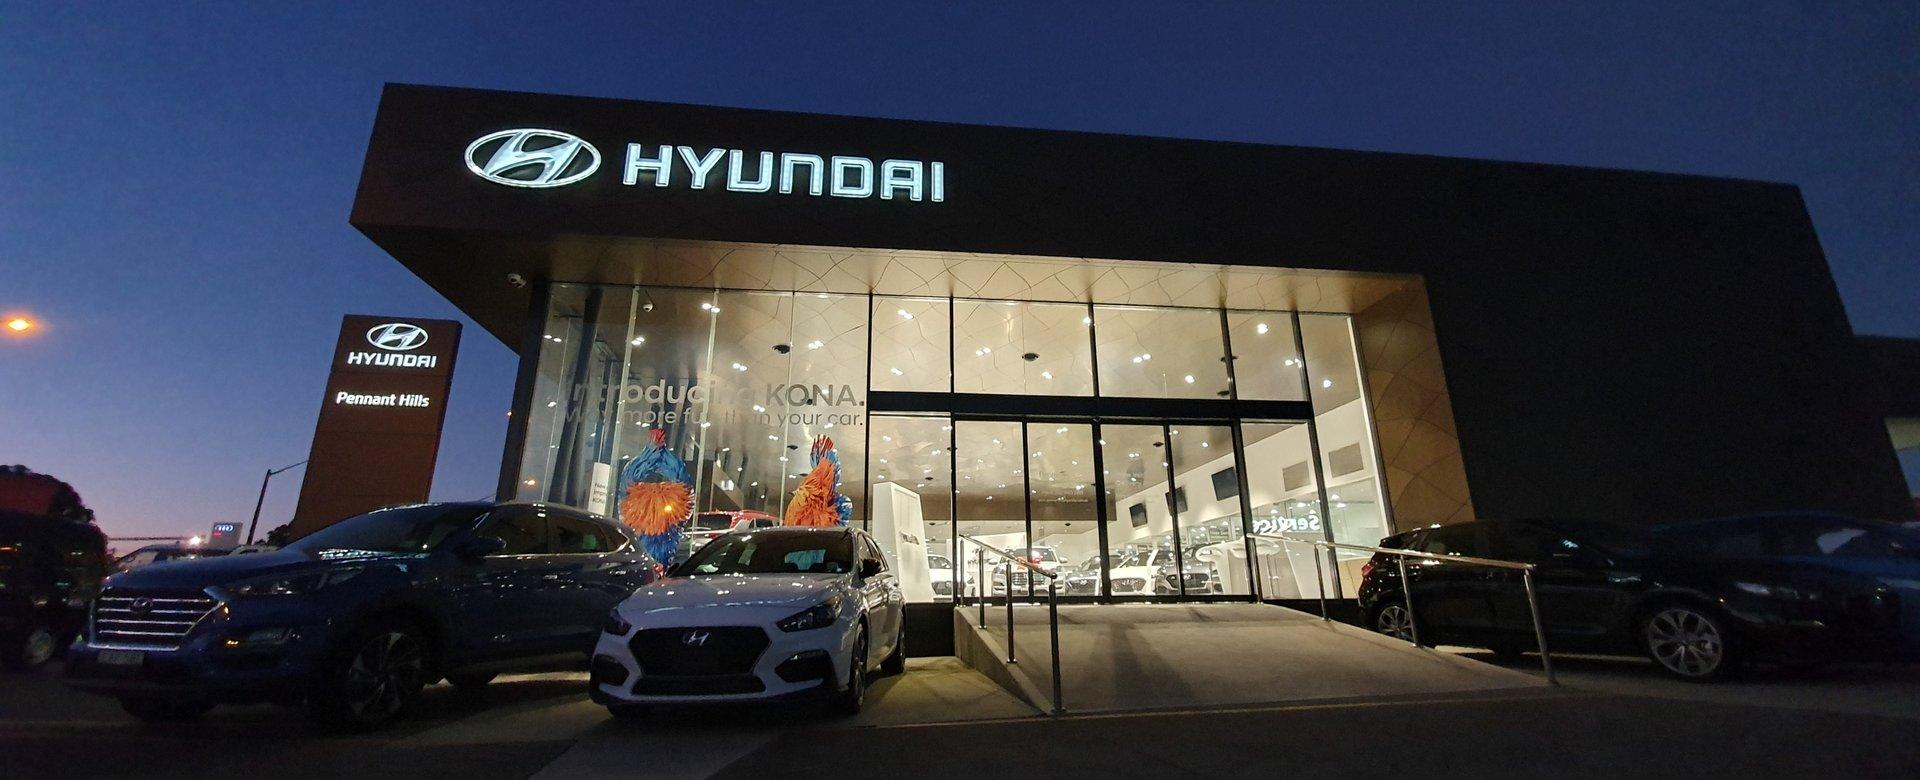 Pennant Hills Hyundai